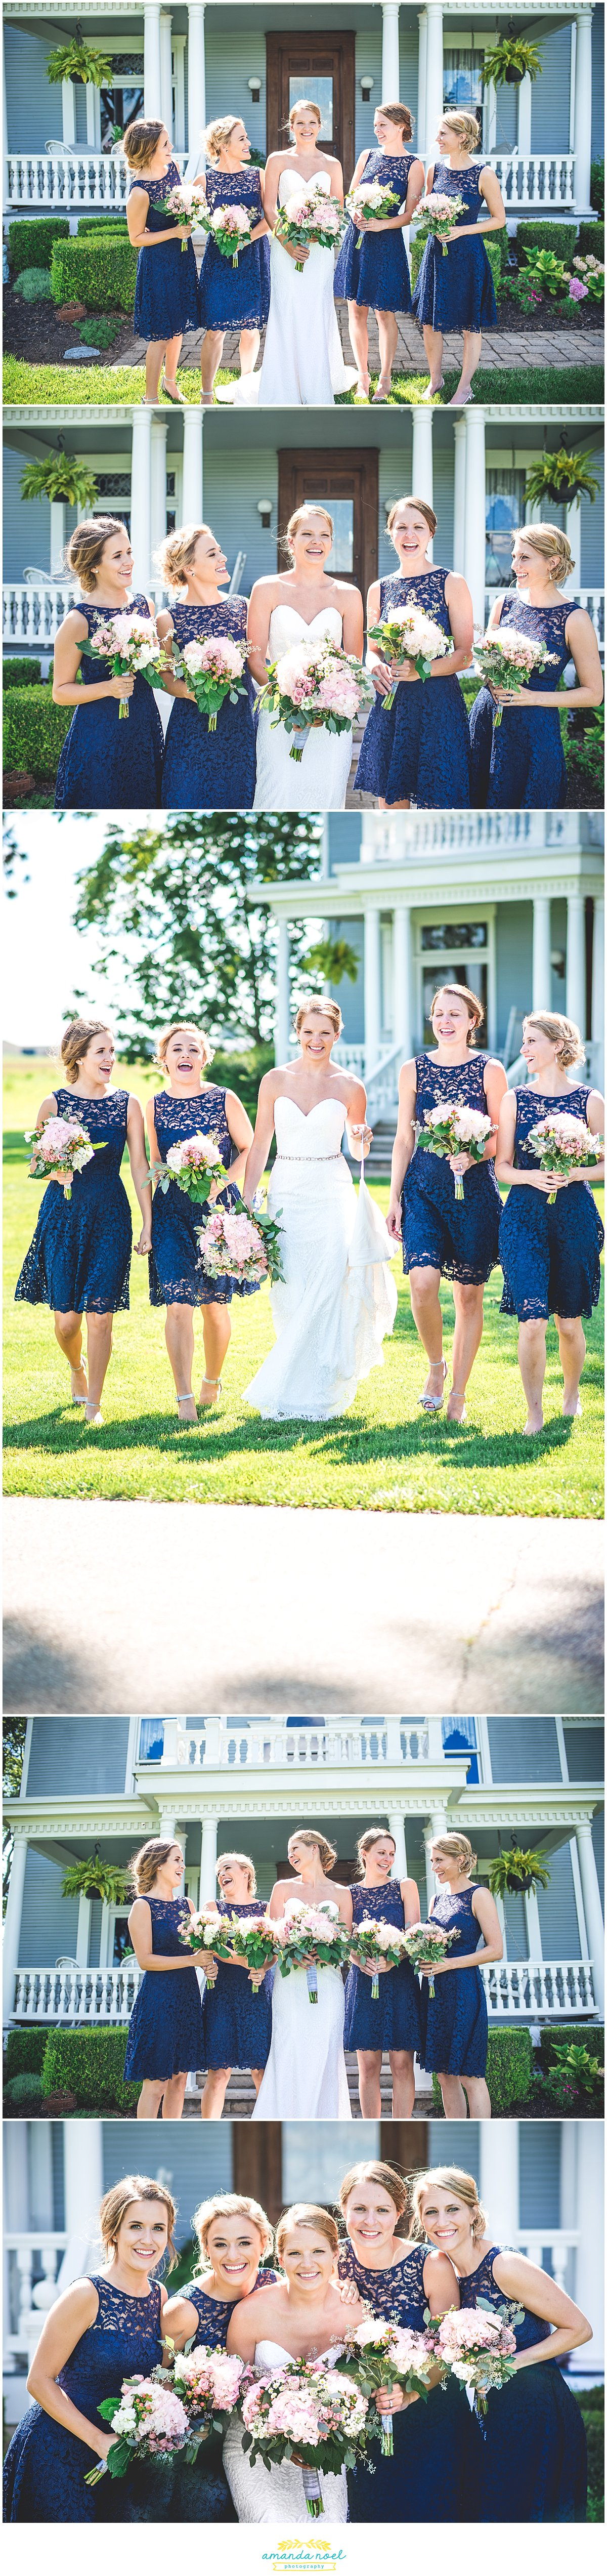 outdoor bridal party portraits